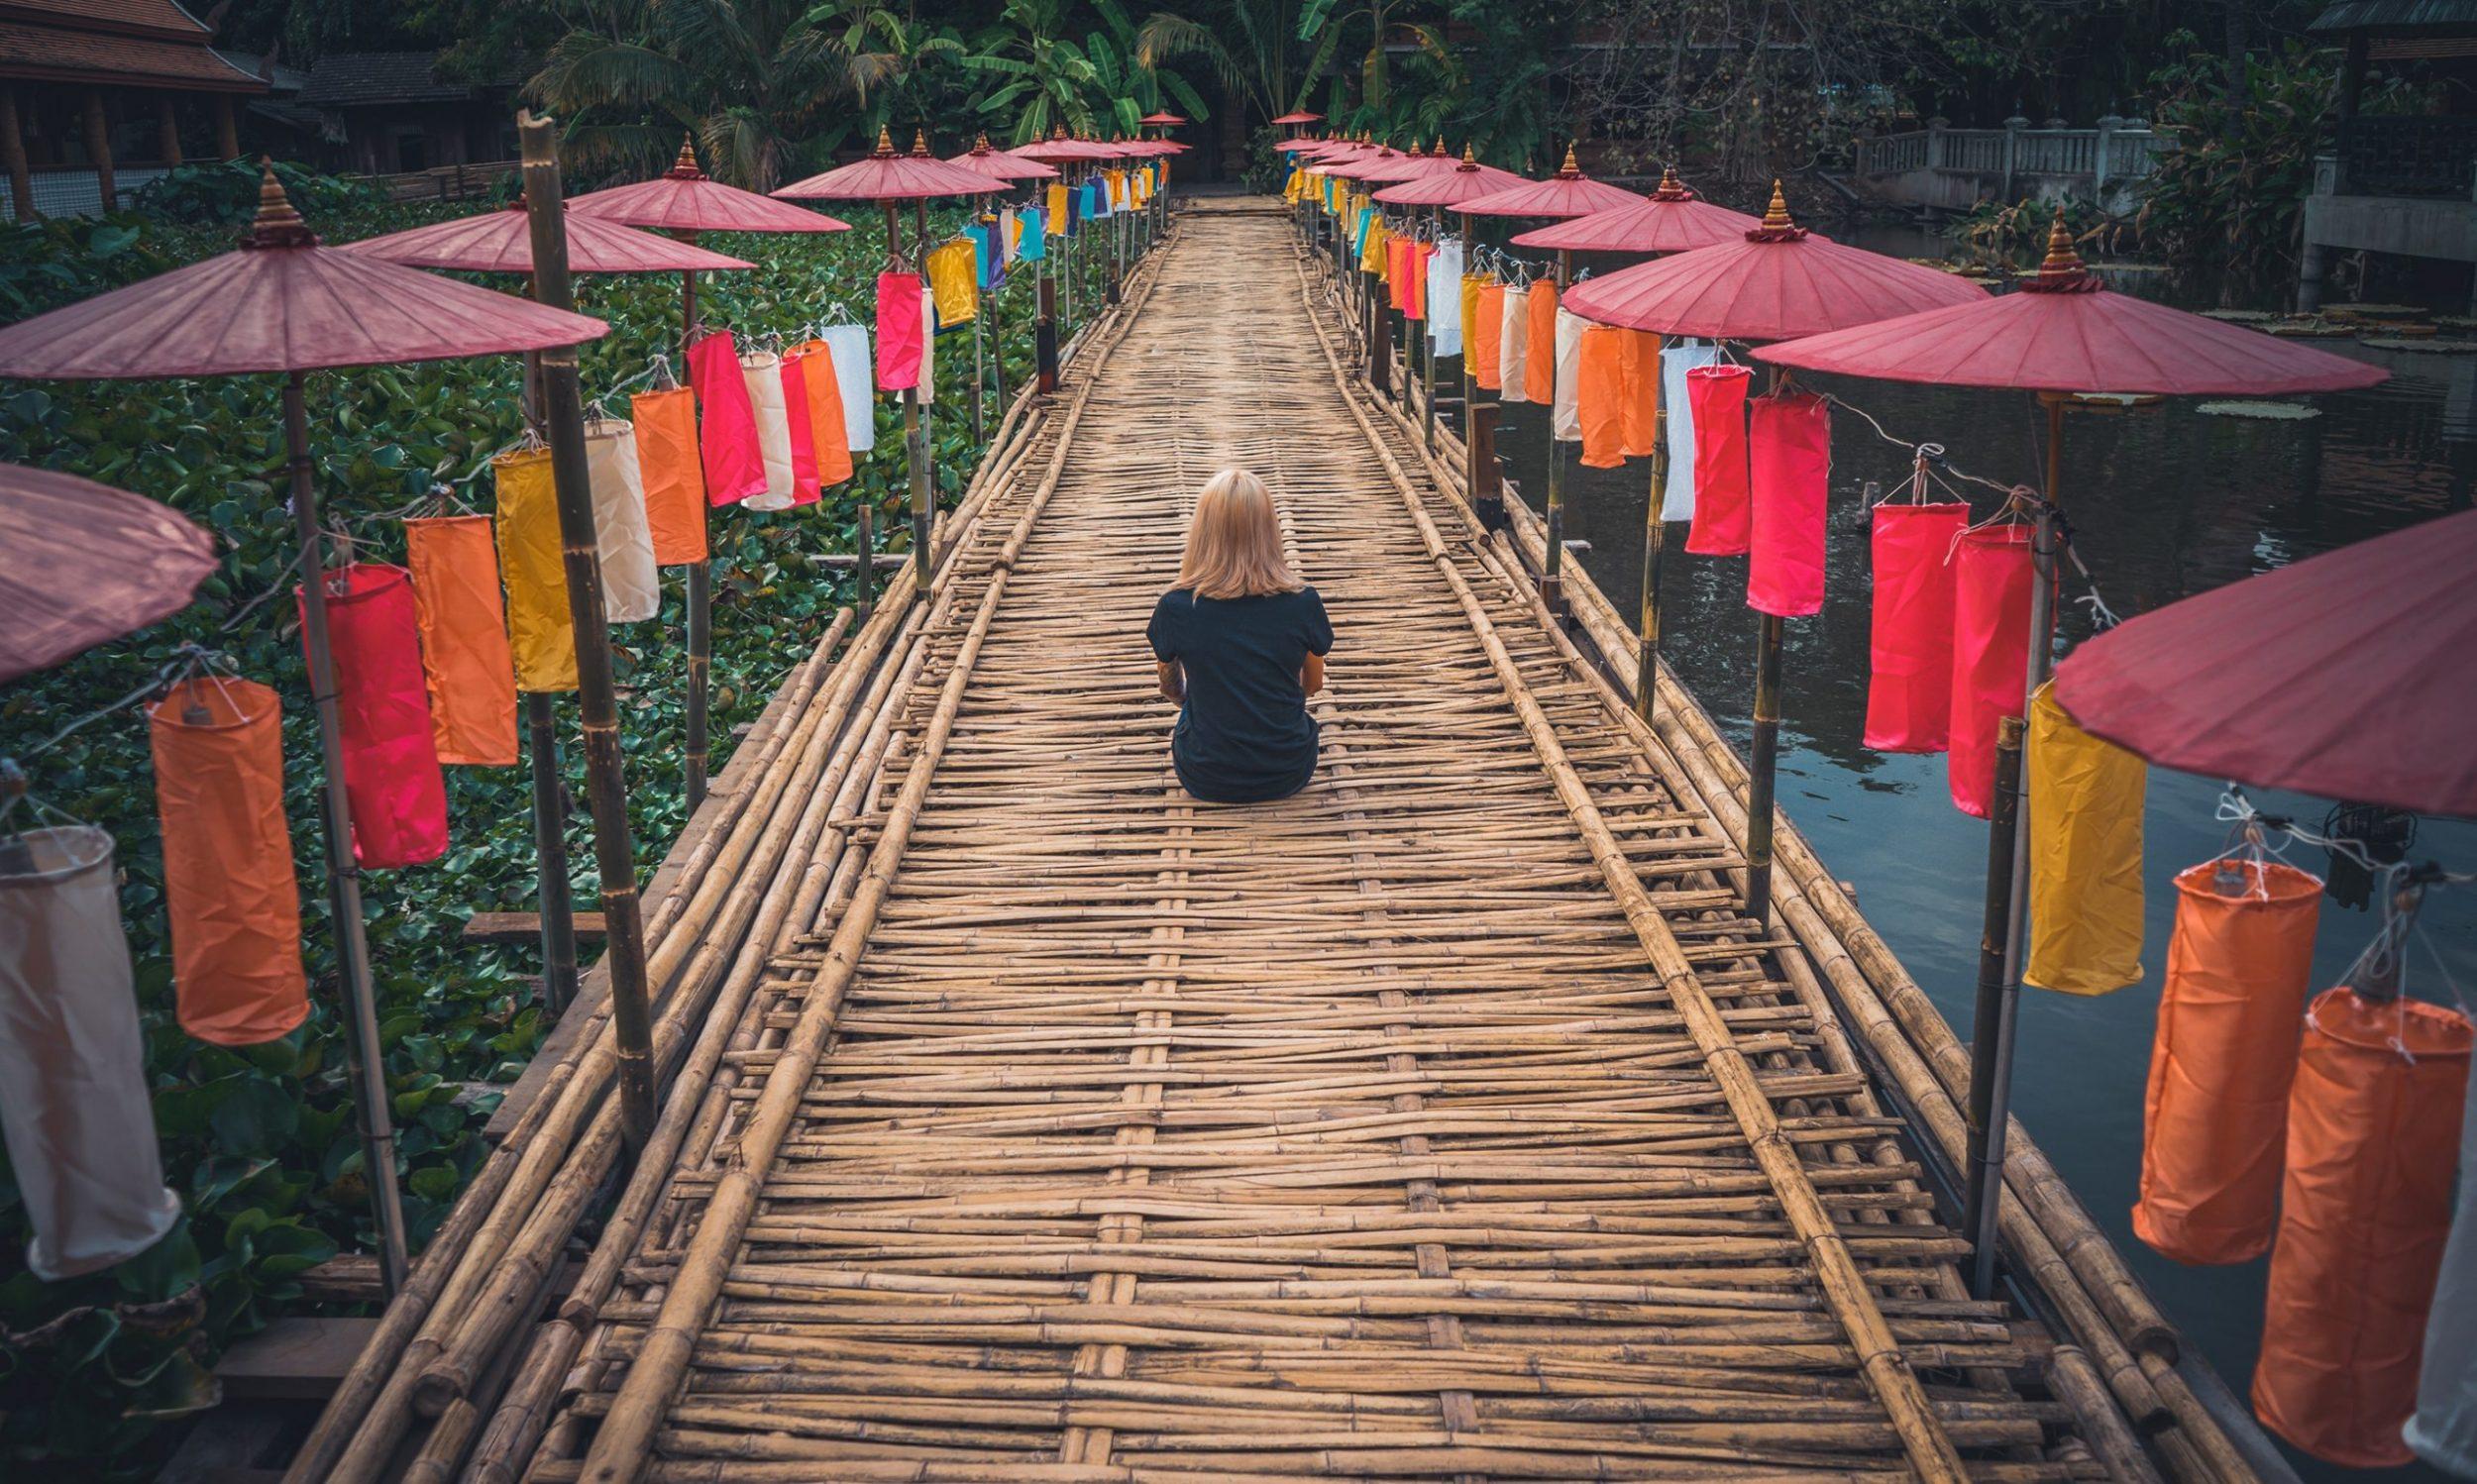 Woman sitting on bamboo dock, Dentons Digital, Website Design, Wiltshire, Somerset